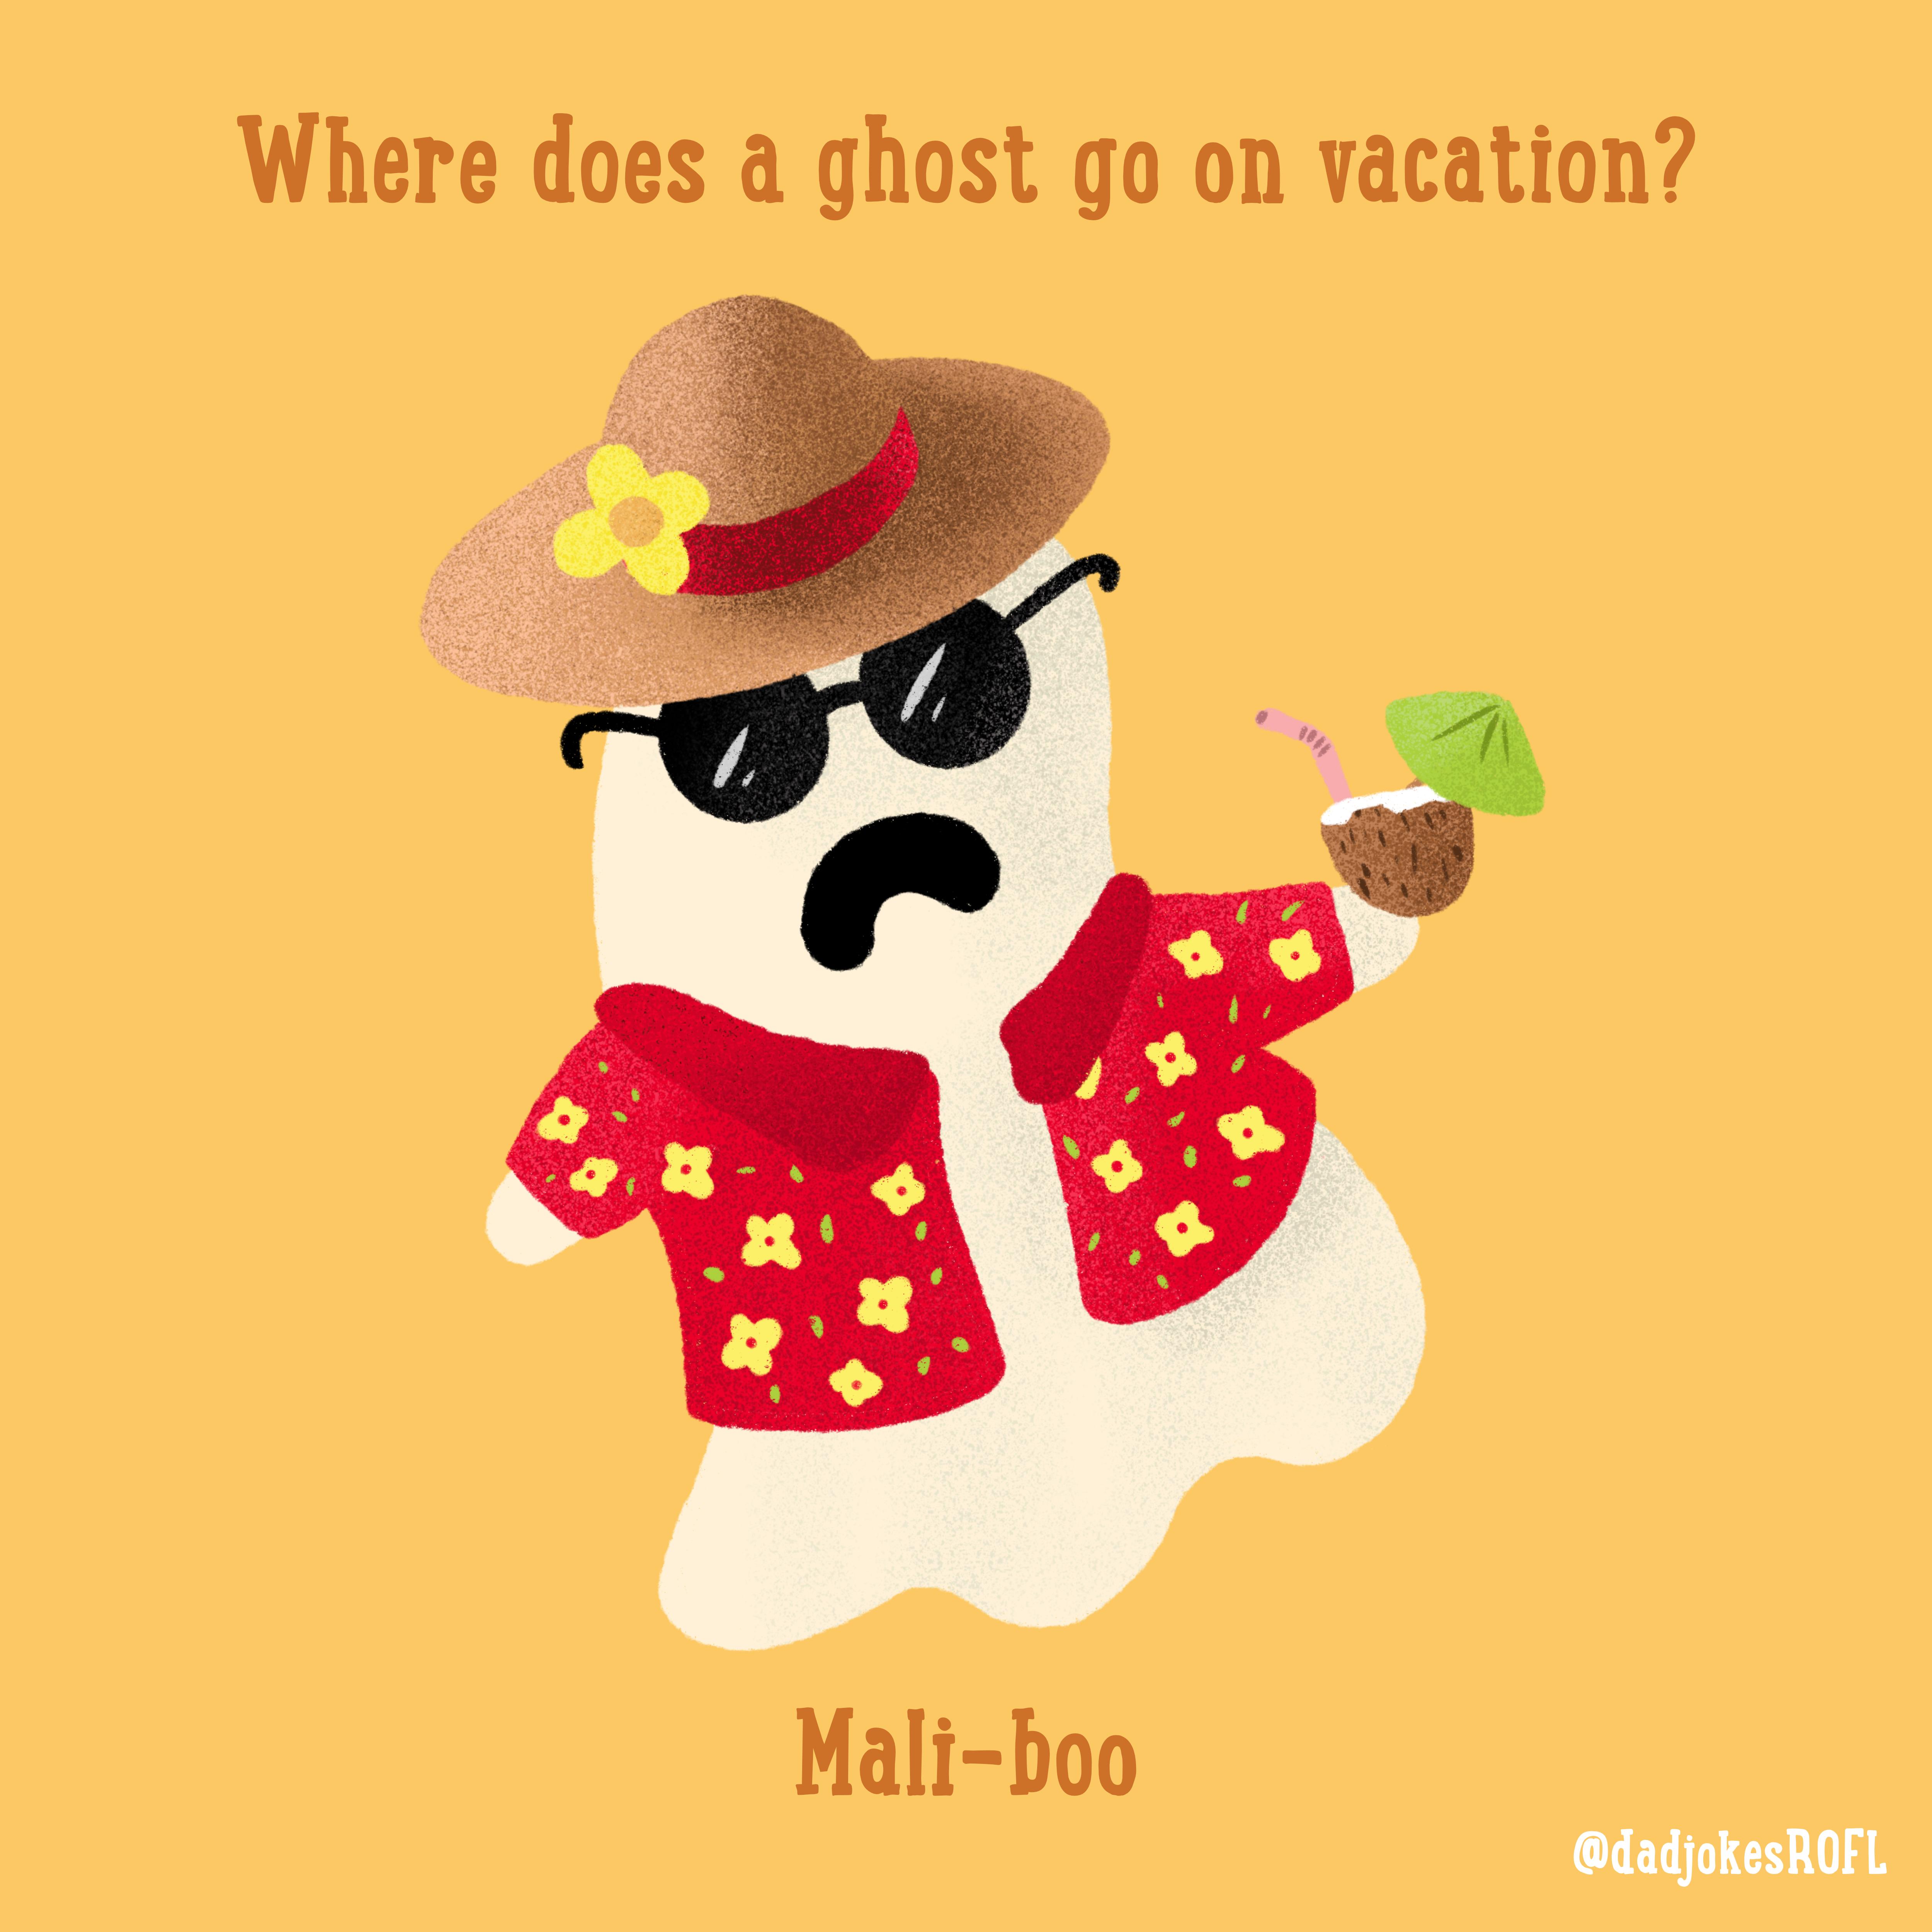 Where Does A Ghost Go On Vacation Mali Boo Halloween Jokes Dad Jokes Funny Halloween Jokes